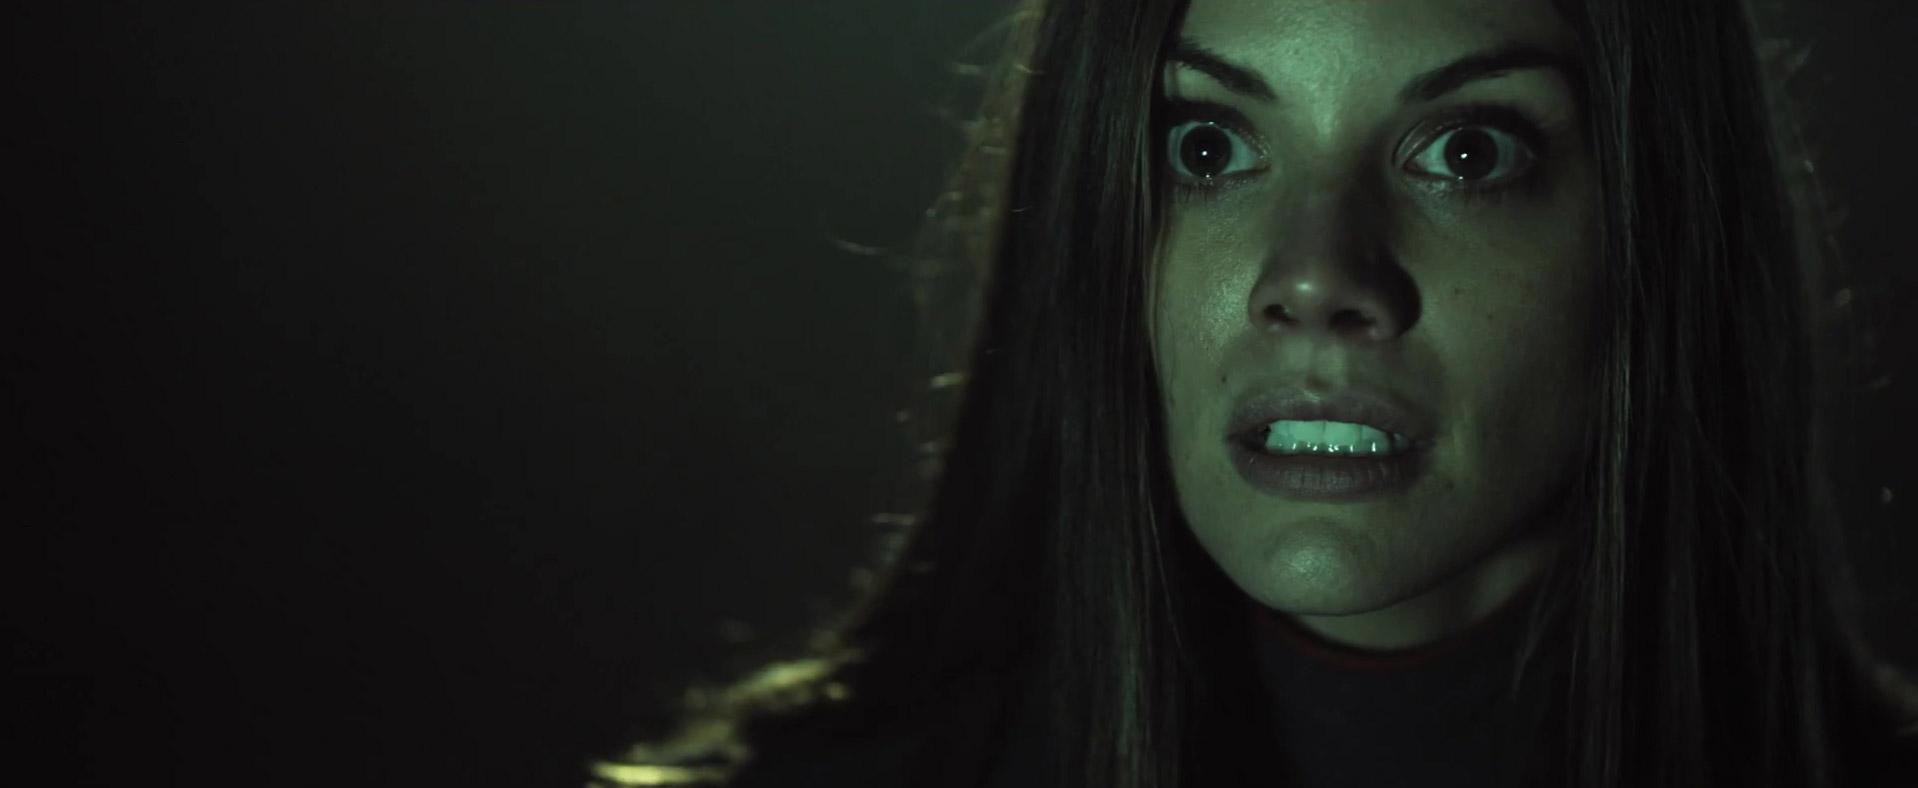 half-life-uk-sci-fi-movie-trailer